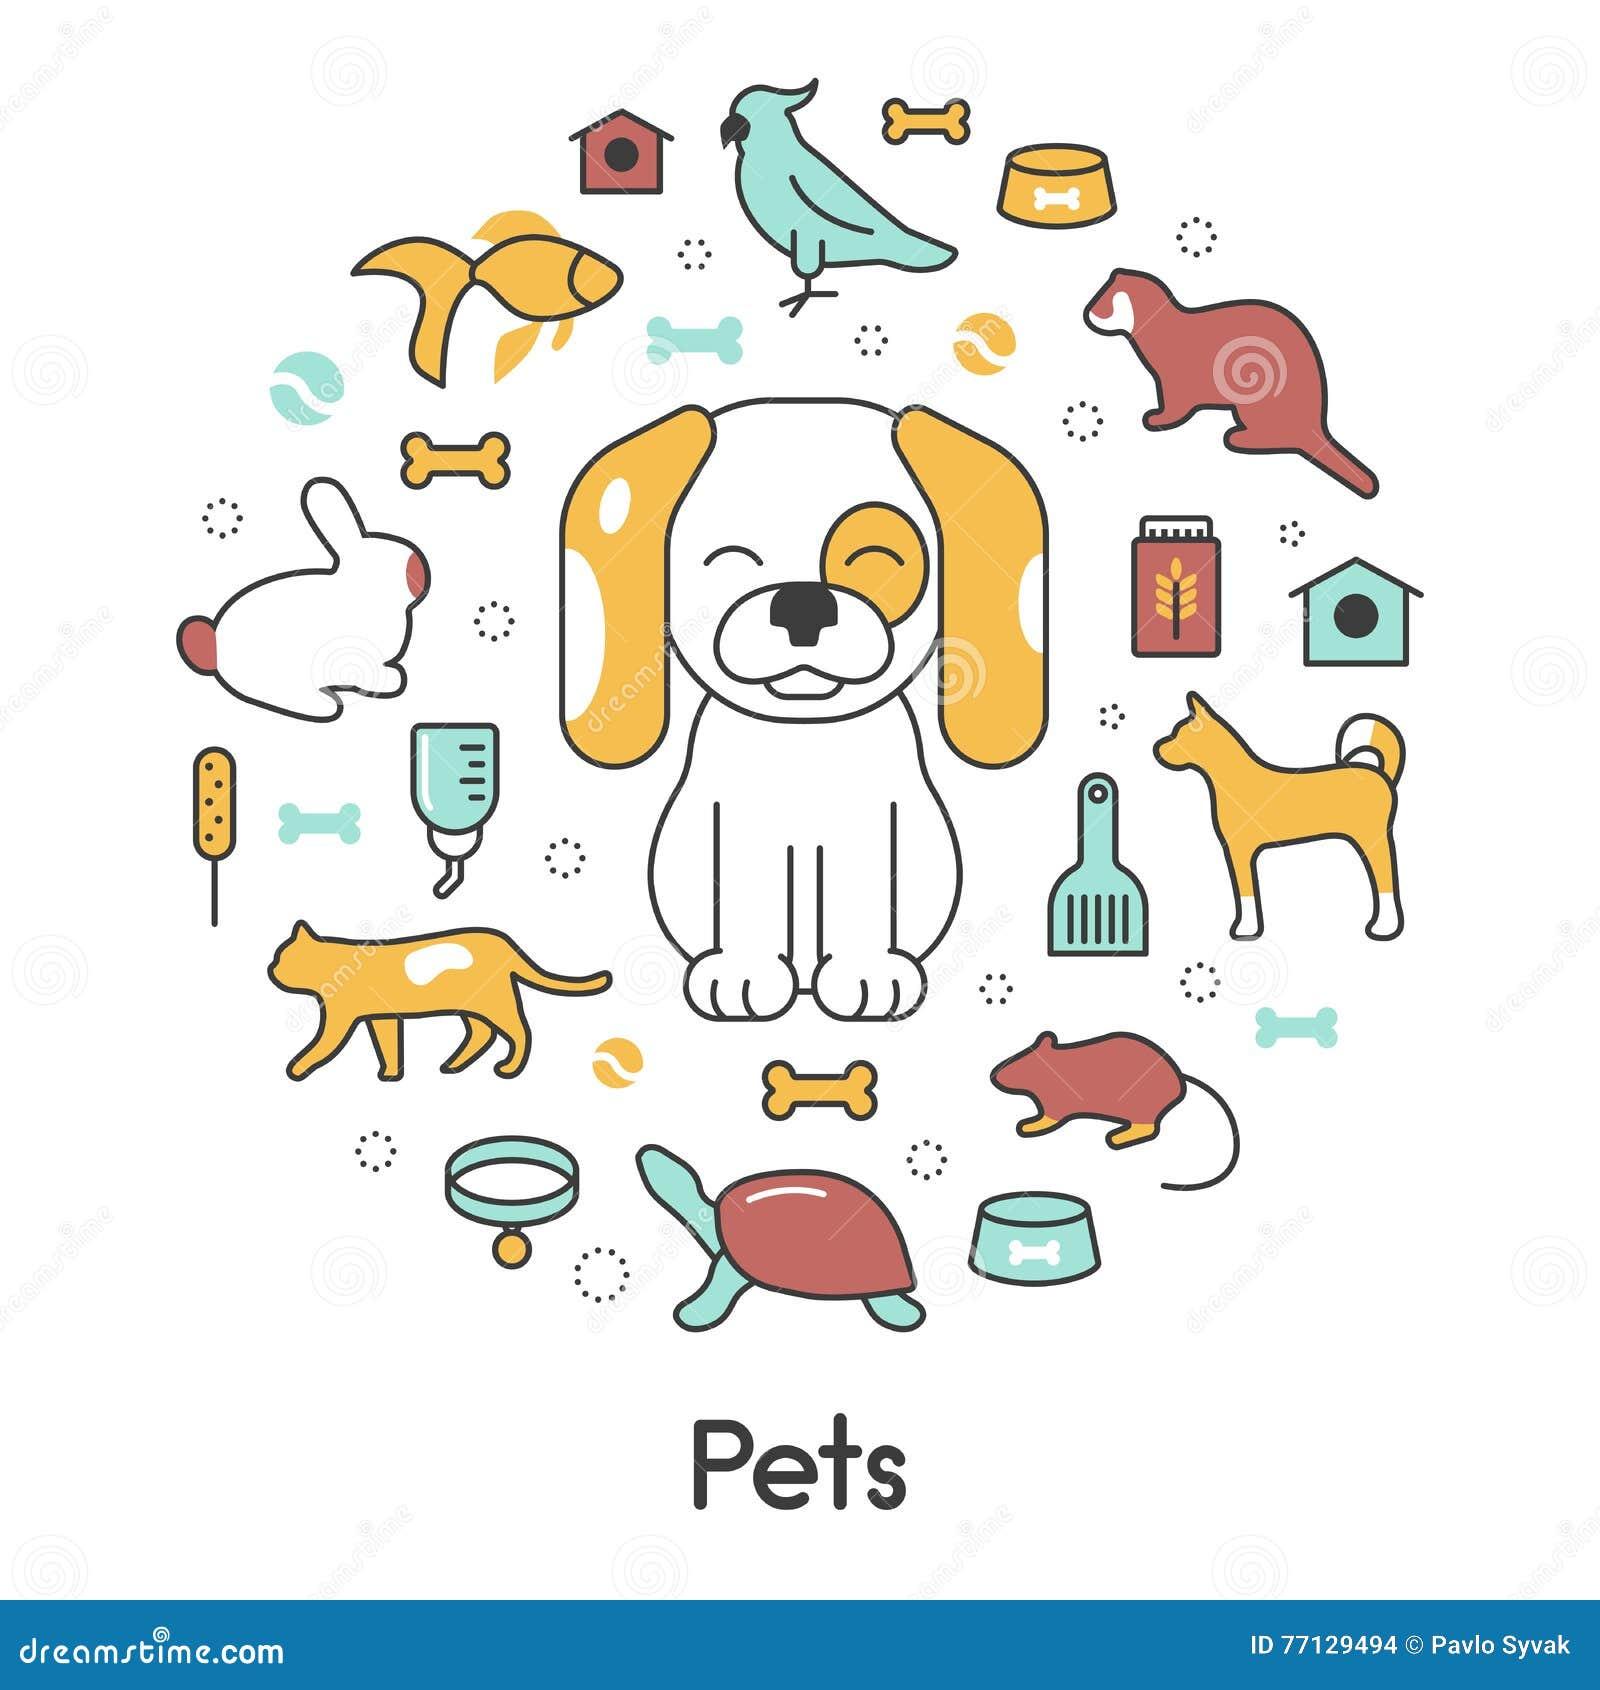 Pets Dog, Cat, Parrot, Rabbit Logo Cartoon Vector